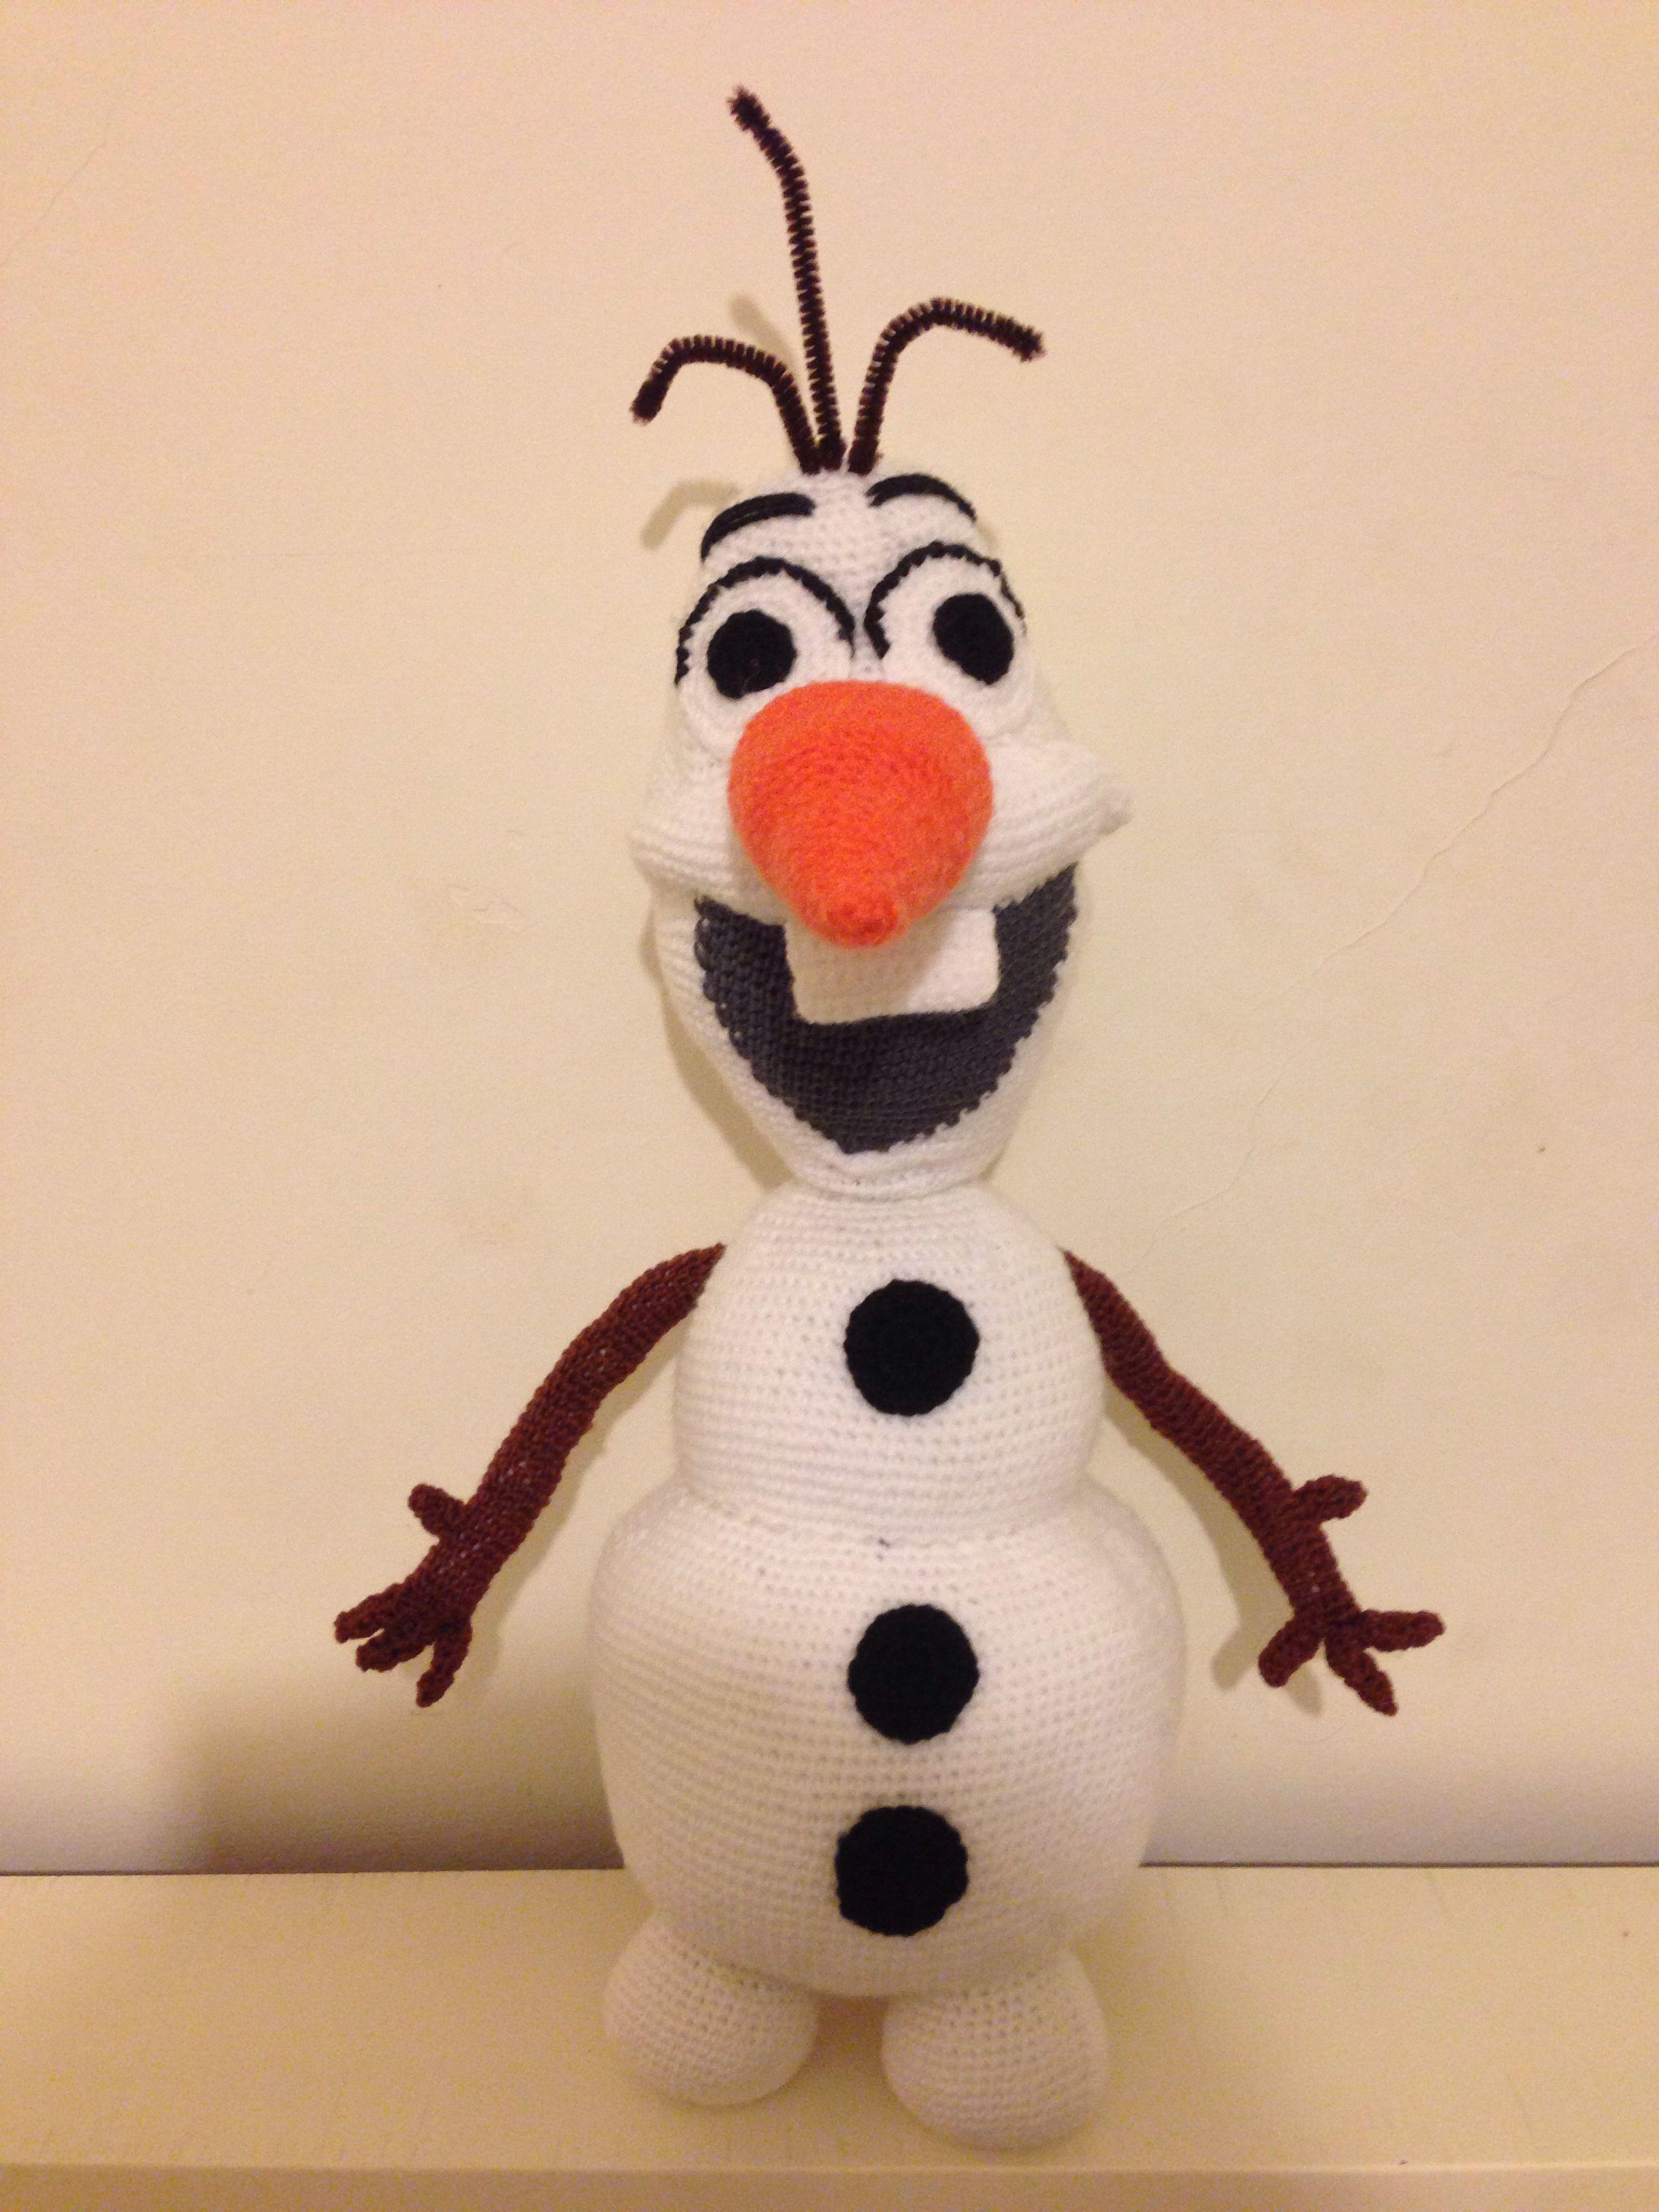 Amigurumi Patterns Olaf : Crochet olaf applique │ frozen │ youtube